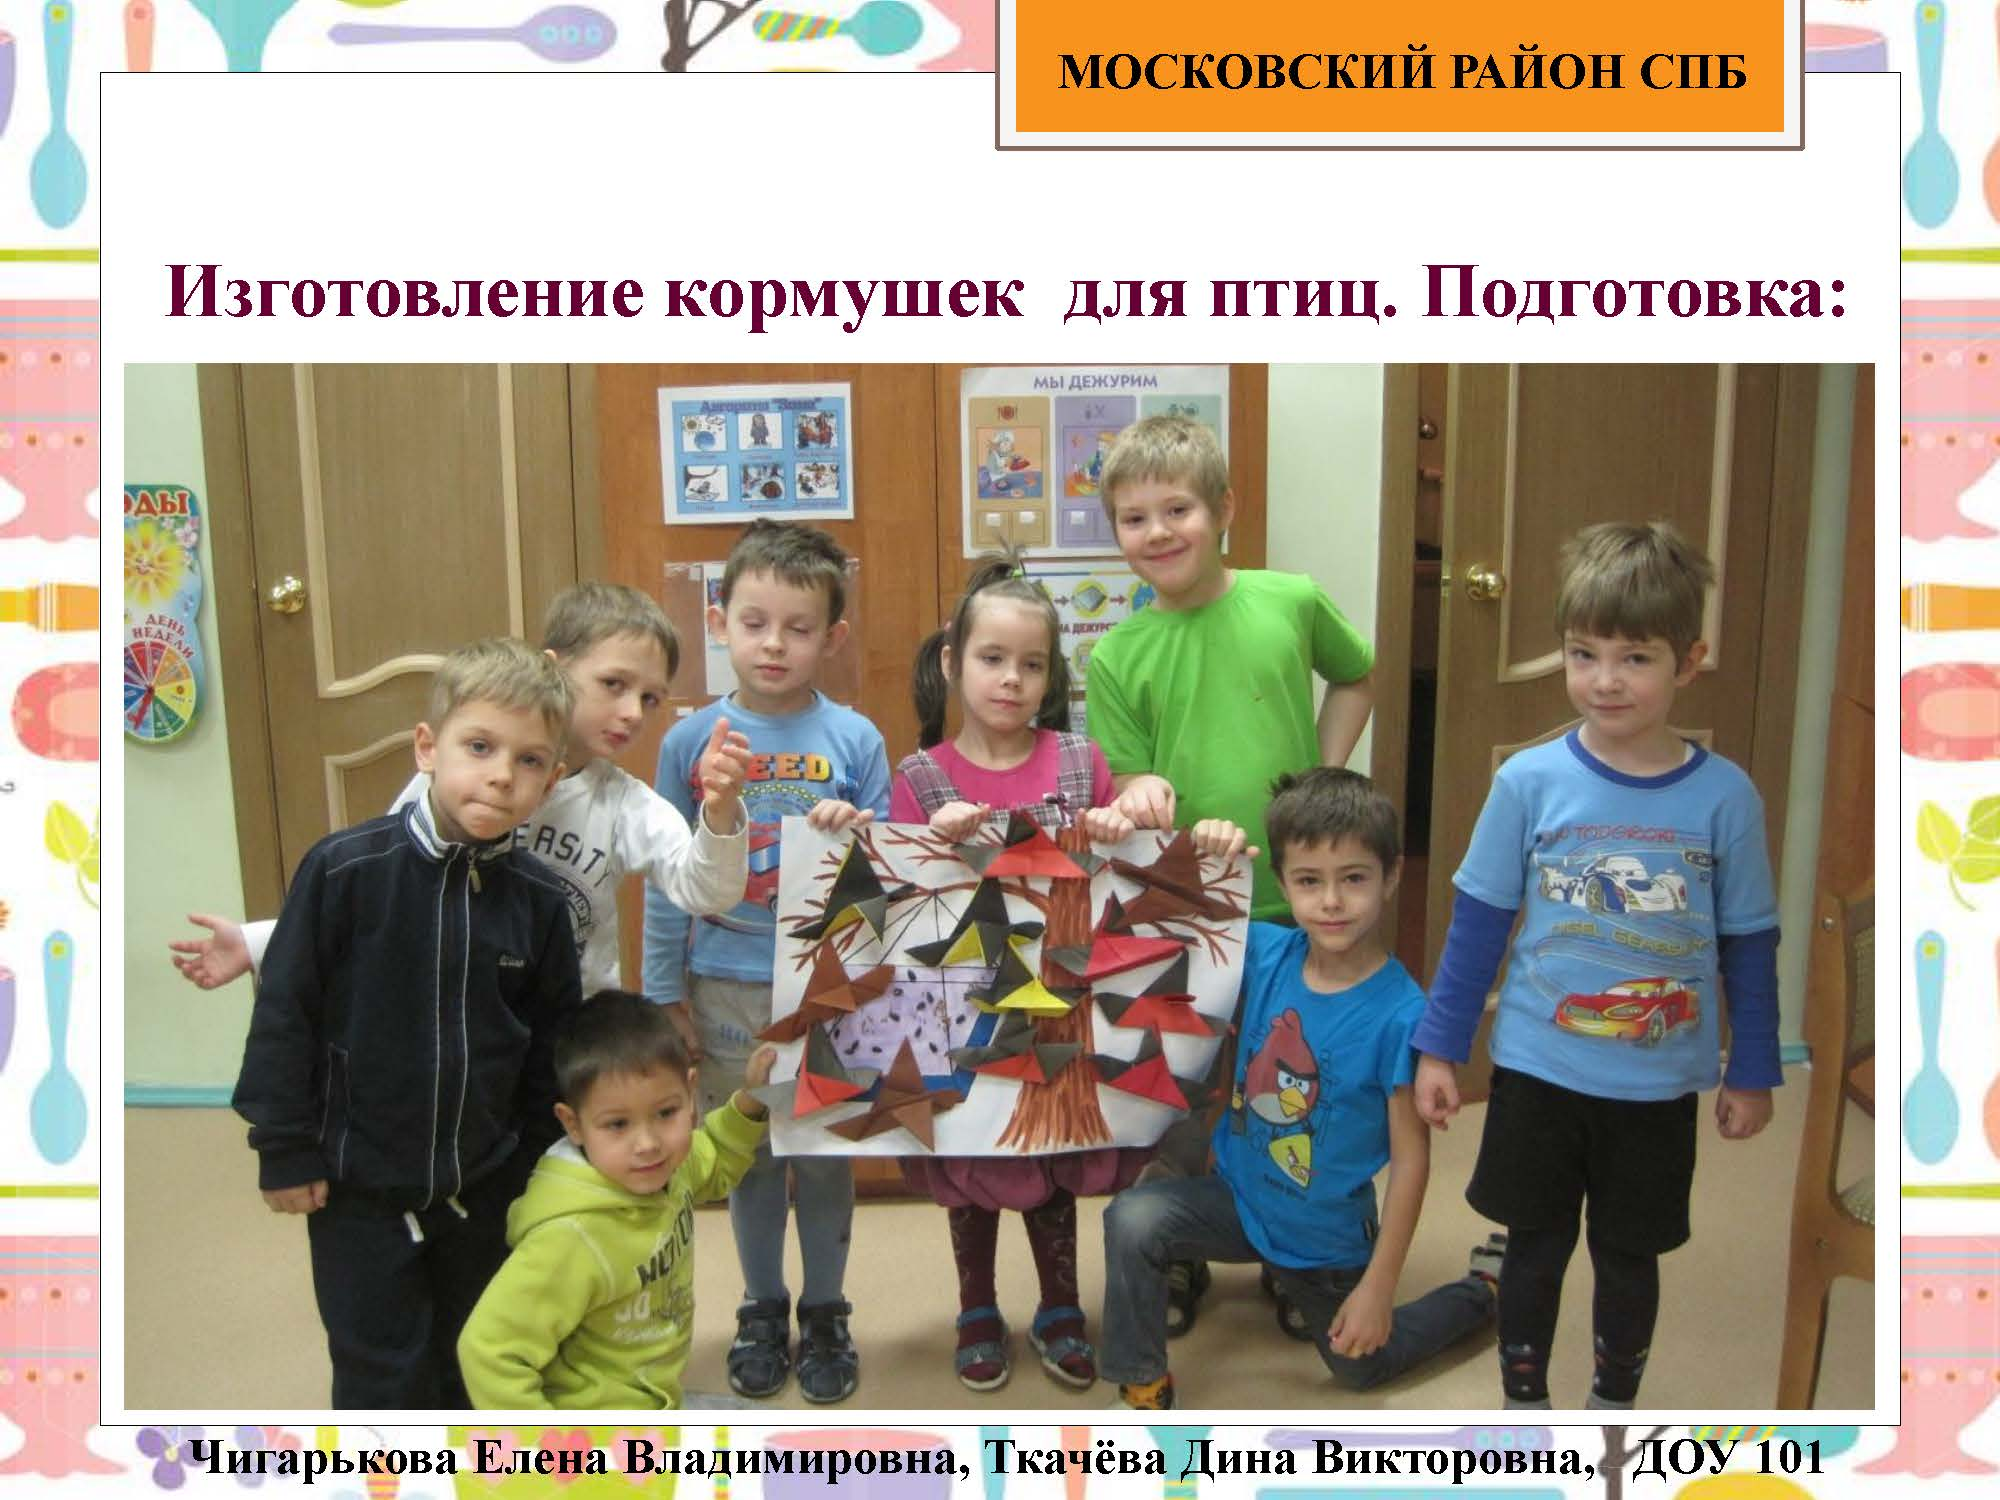 Секция 8. ДОУ 101, ПСИ. Московский район_Страница_06